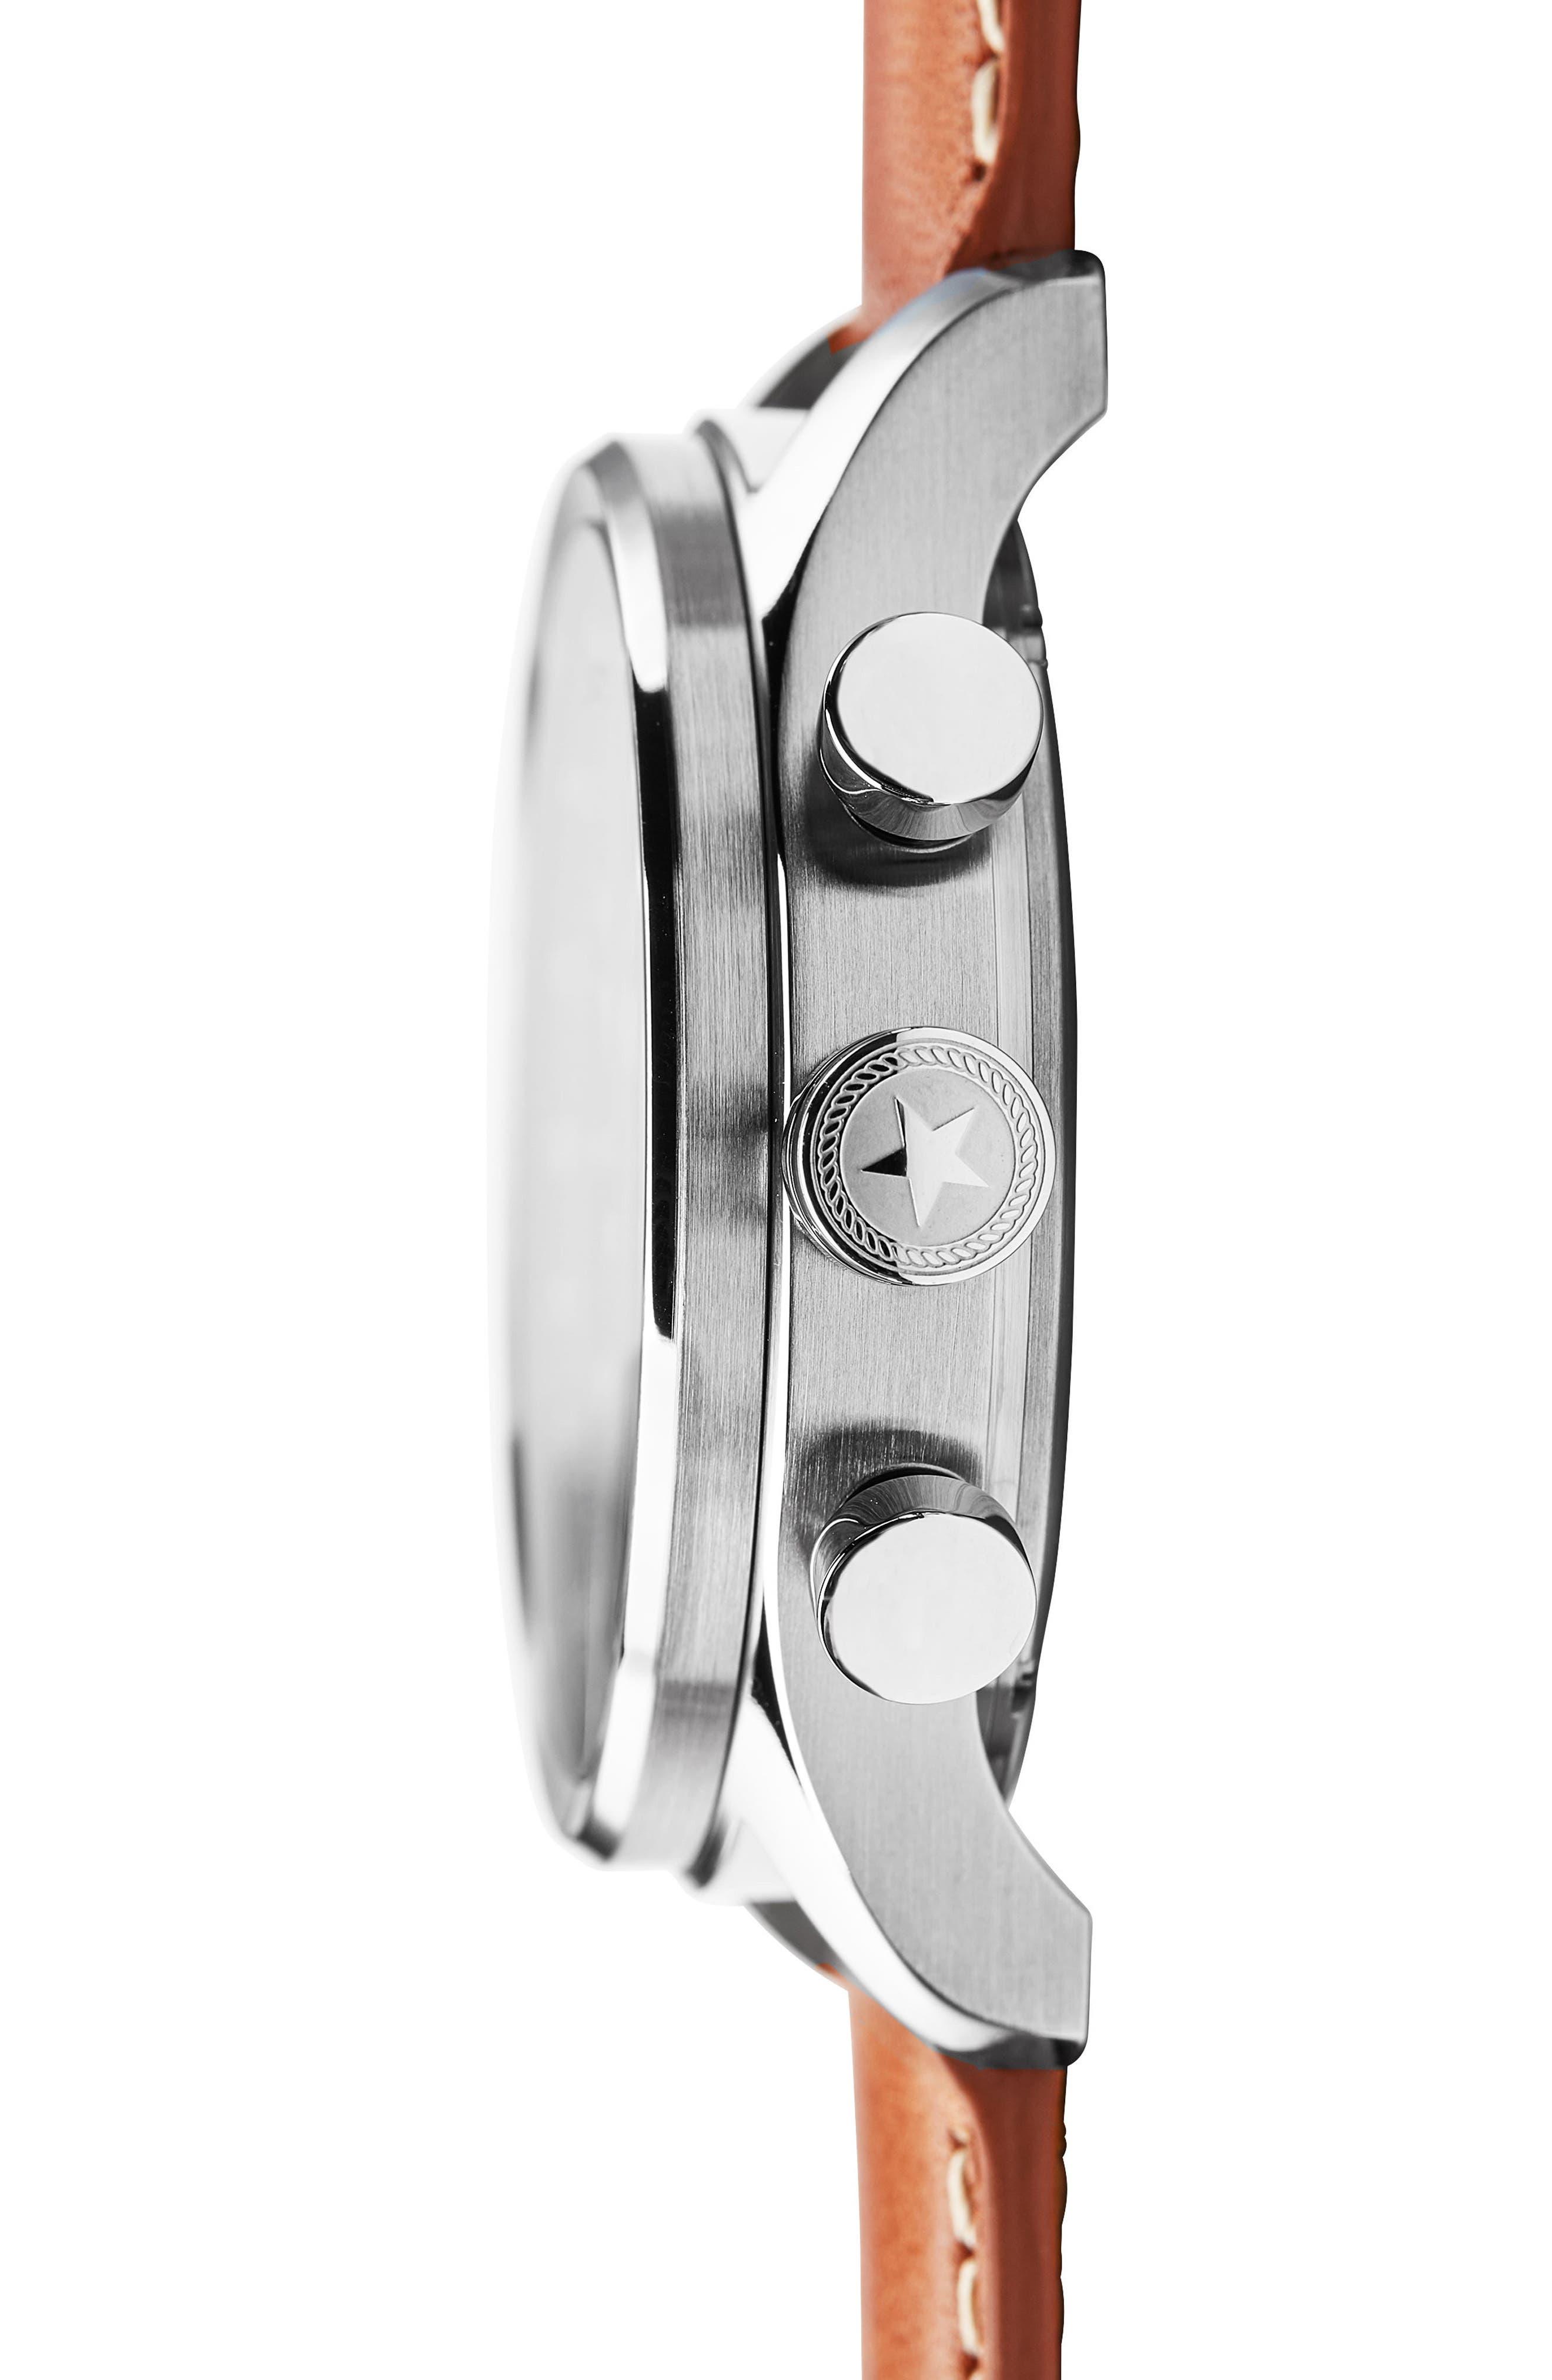 JACK MASON, Nautical Chronograph Leather Strap Watch, 42mm, Alternate thumbnail 3, color, GREY/ BROWN